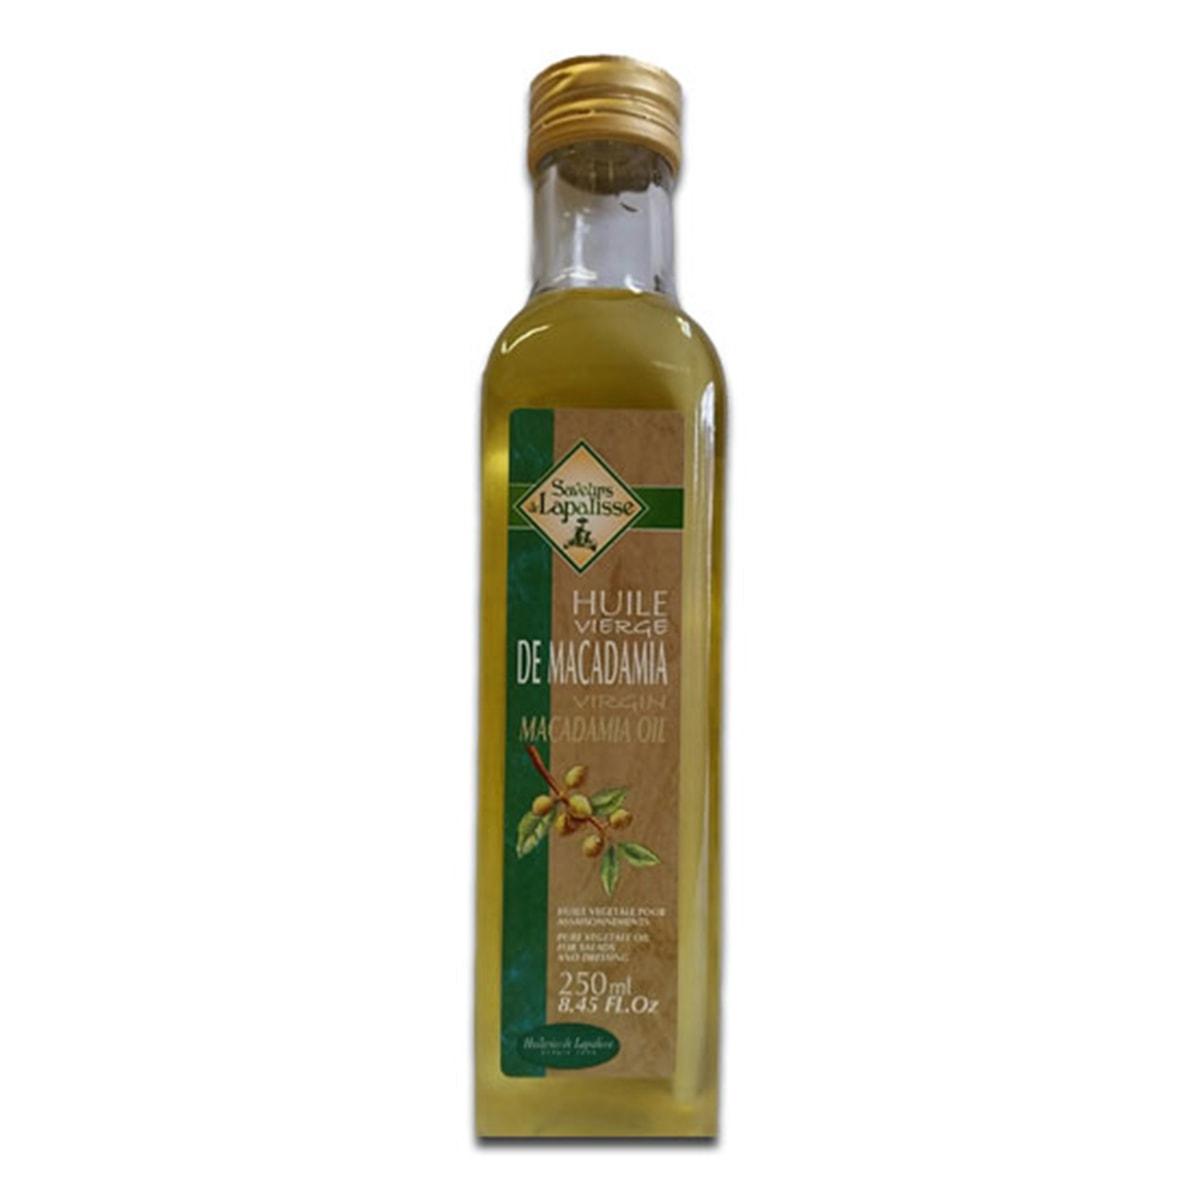 Buy Saveurs De Lapalisse Huile De Macadamia (100% Pure Macadamia Oil) - 250 ml